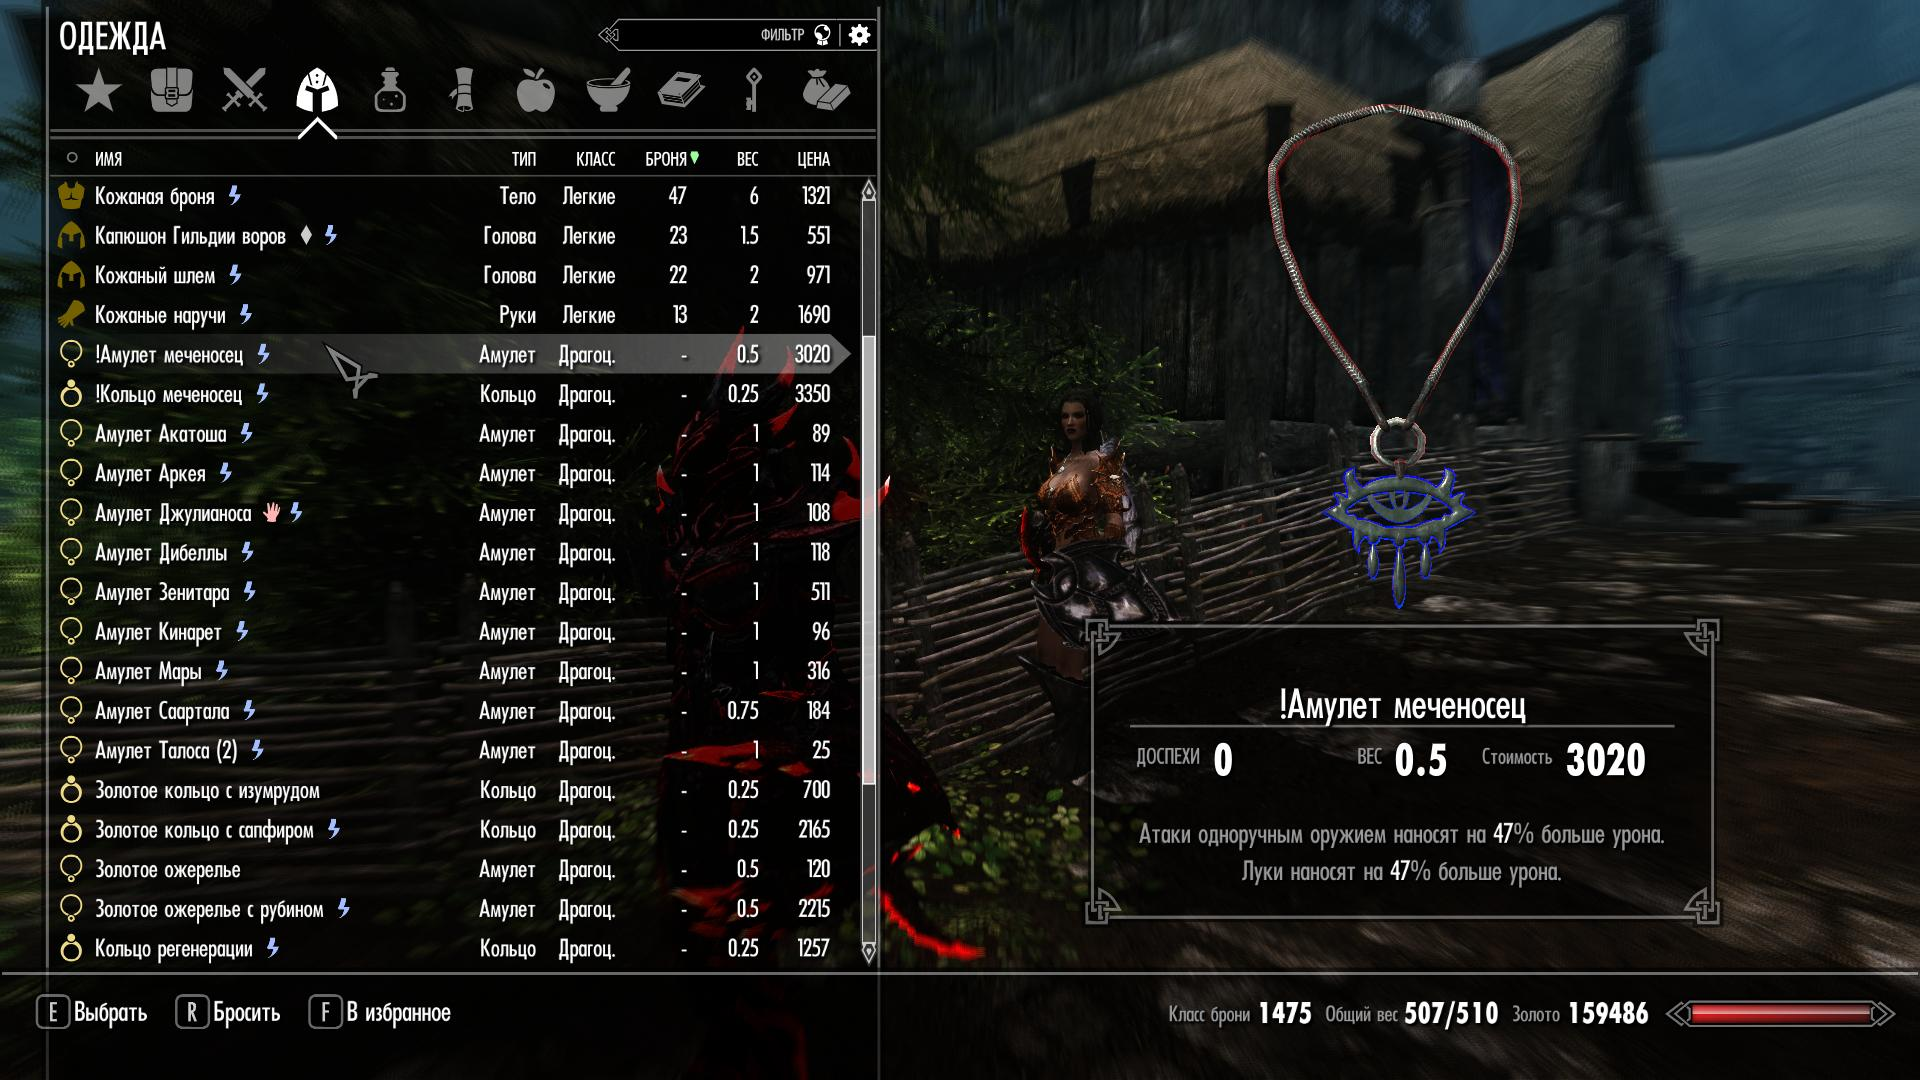 000884.jpg - Elder Scrolls 5: Skyrim, the